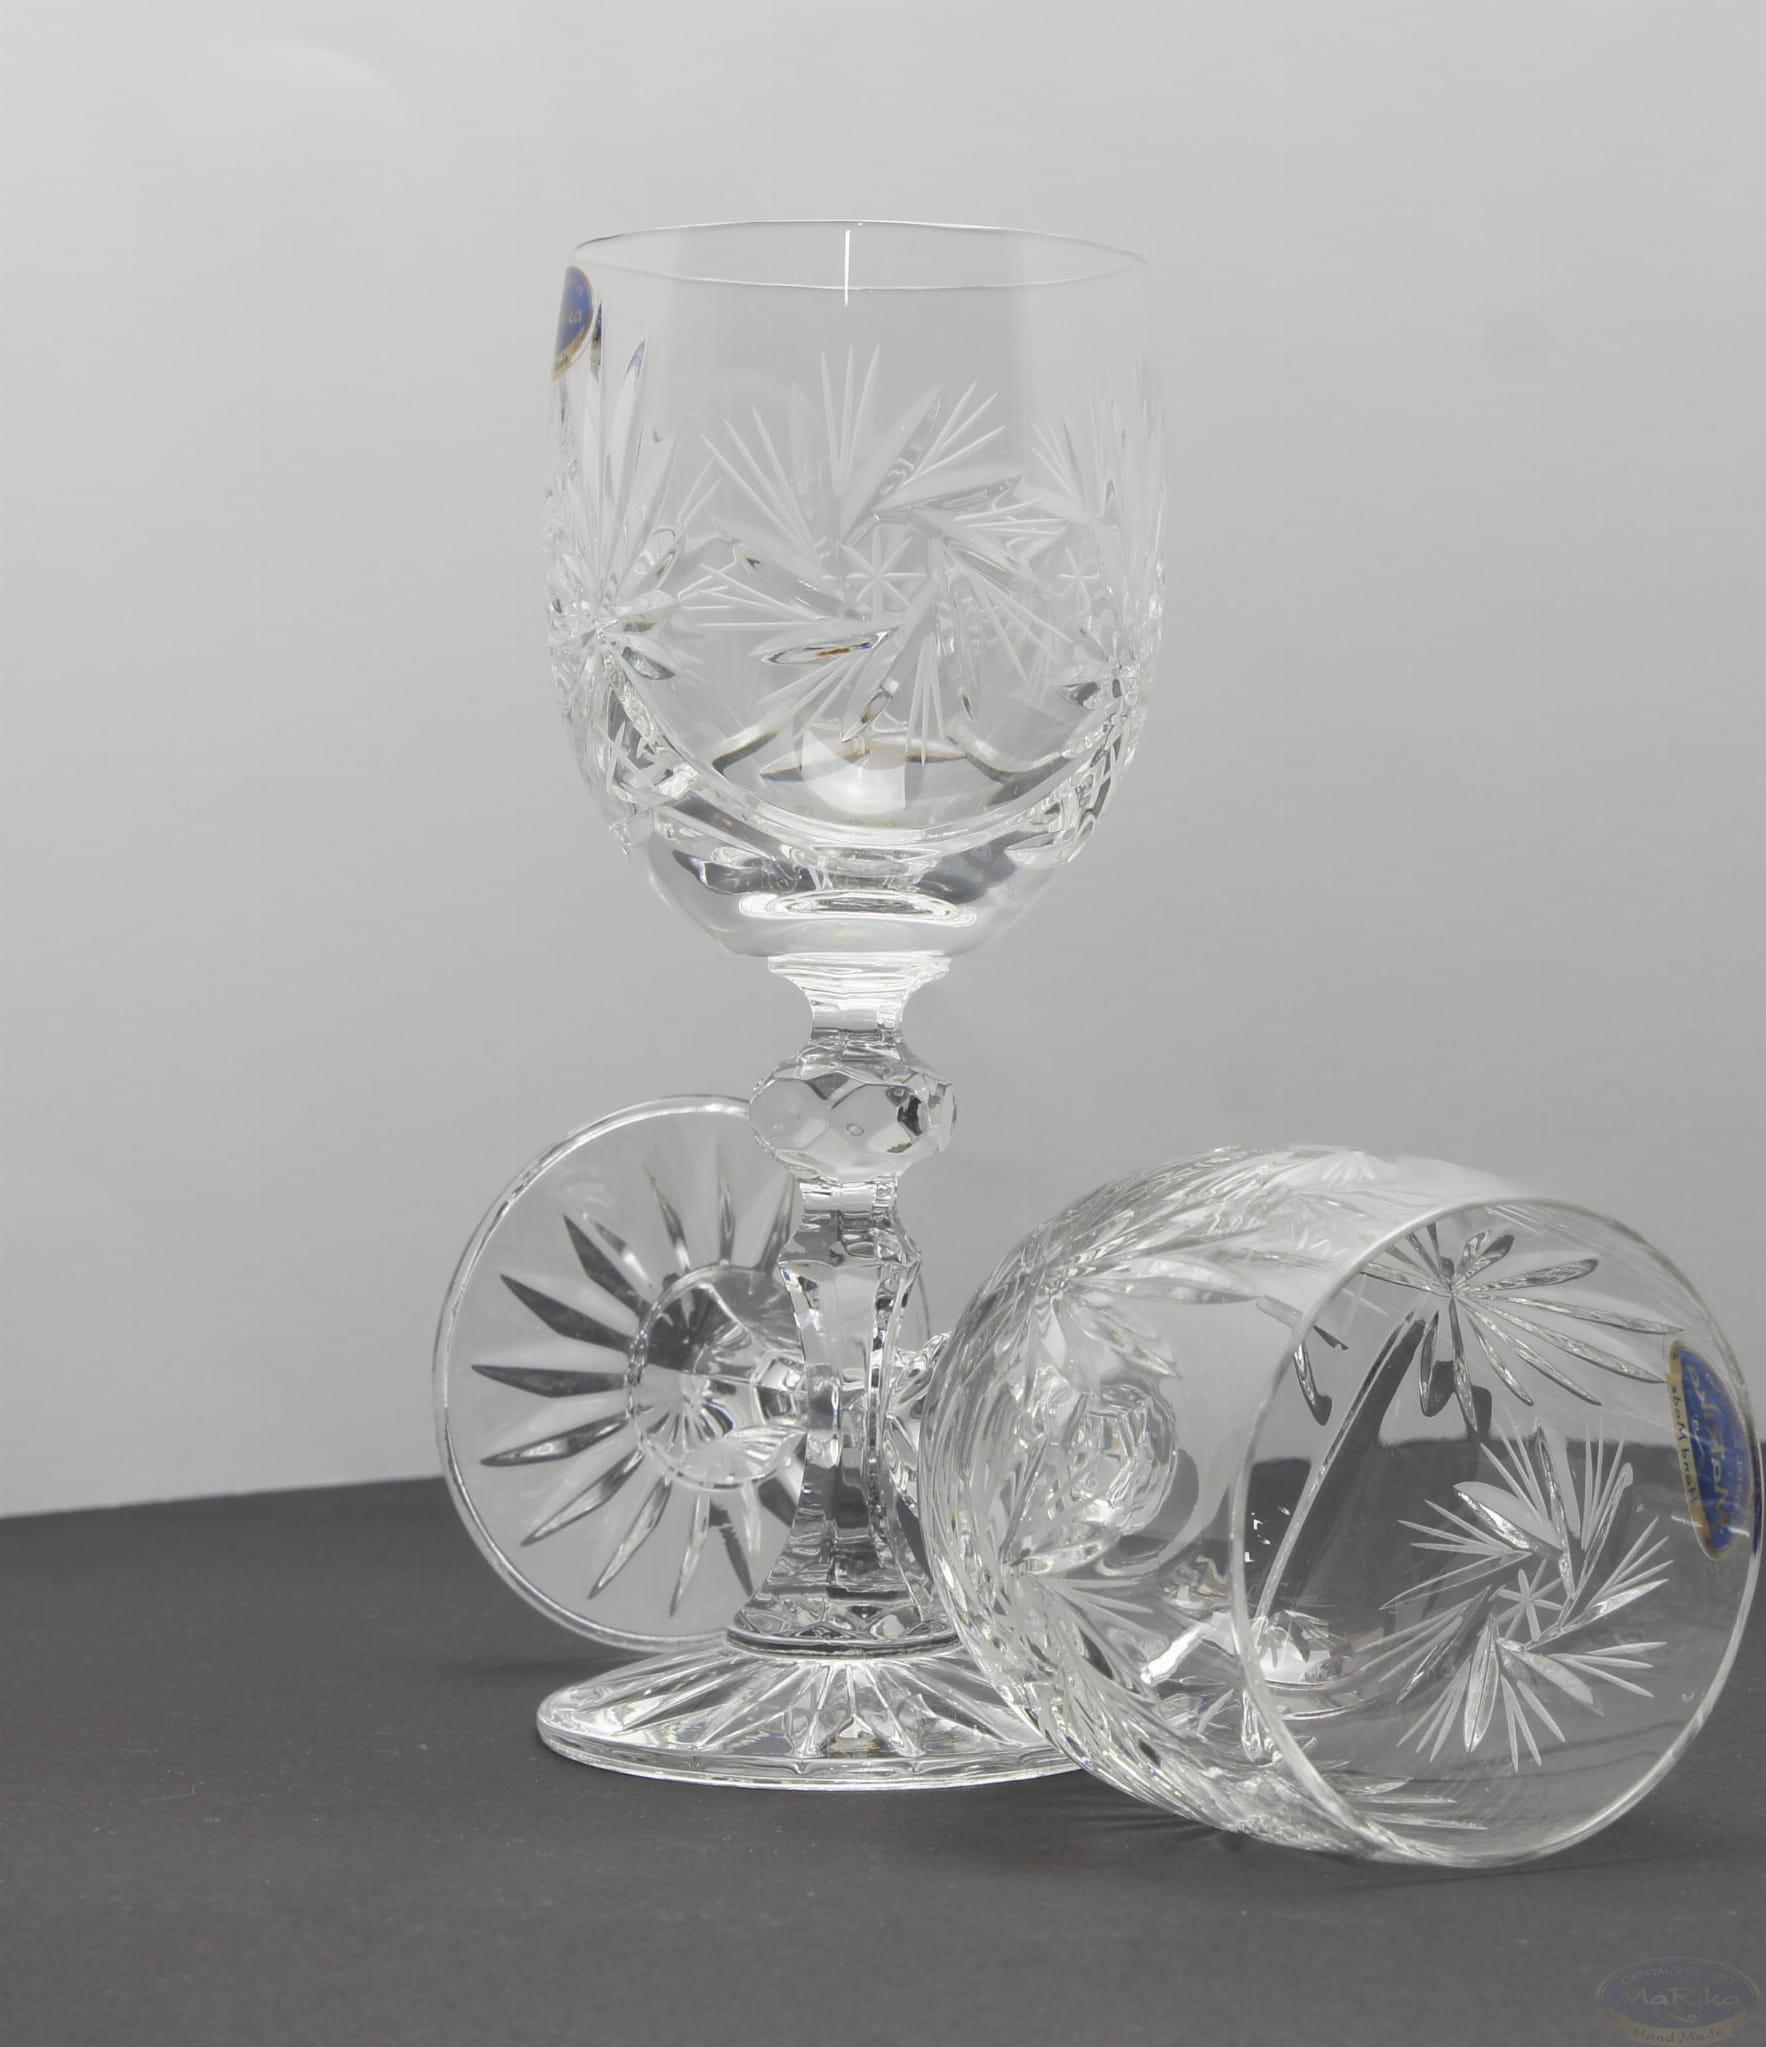 Kryształowe Kieliszki Do Wina 170ml Młynek Zph Marika